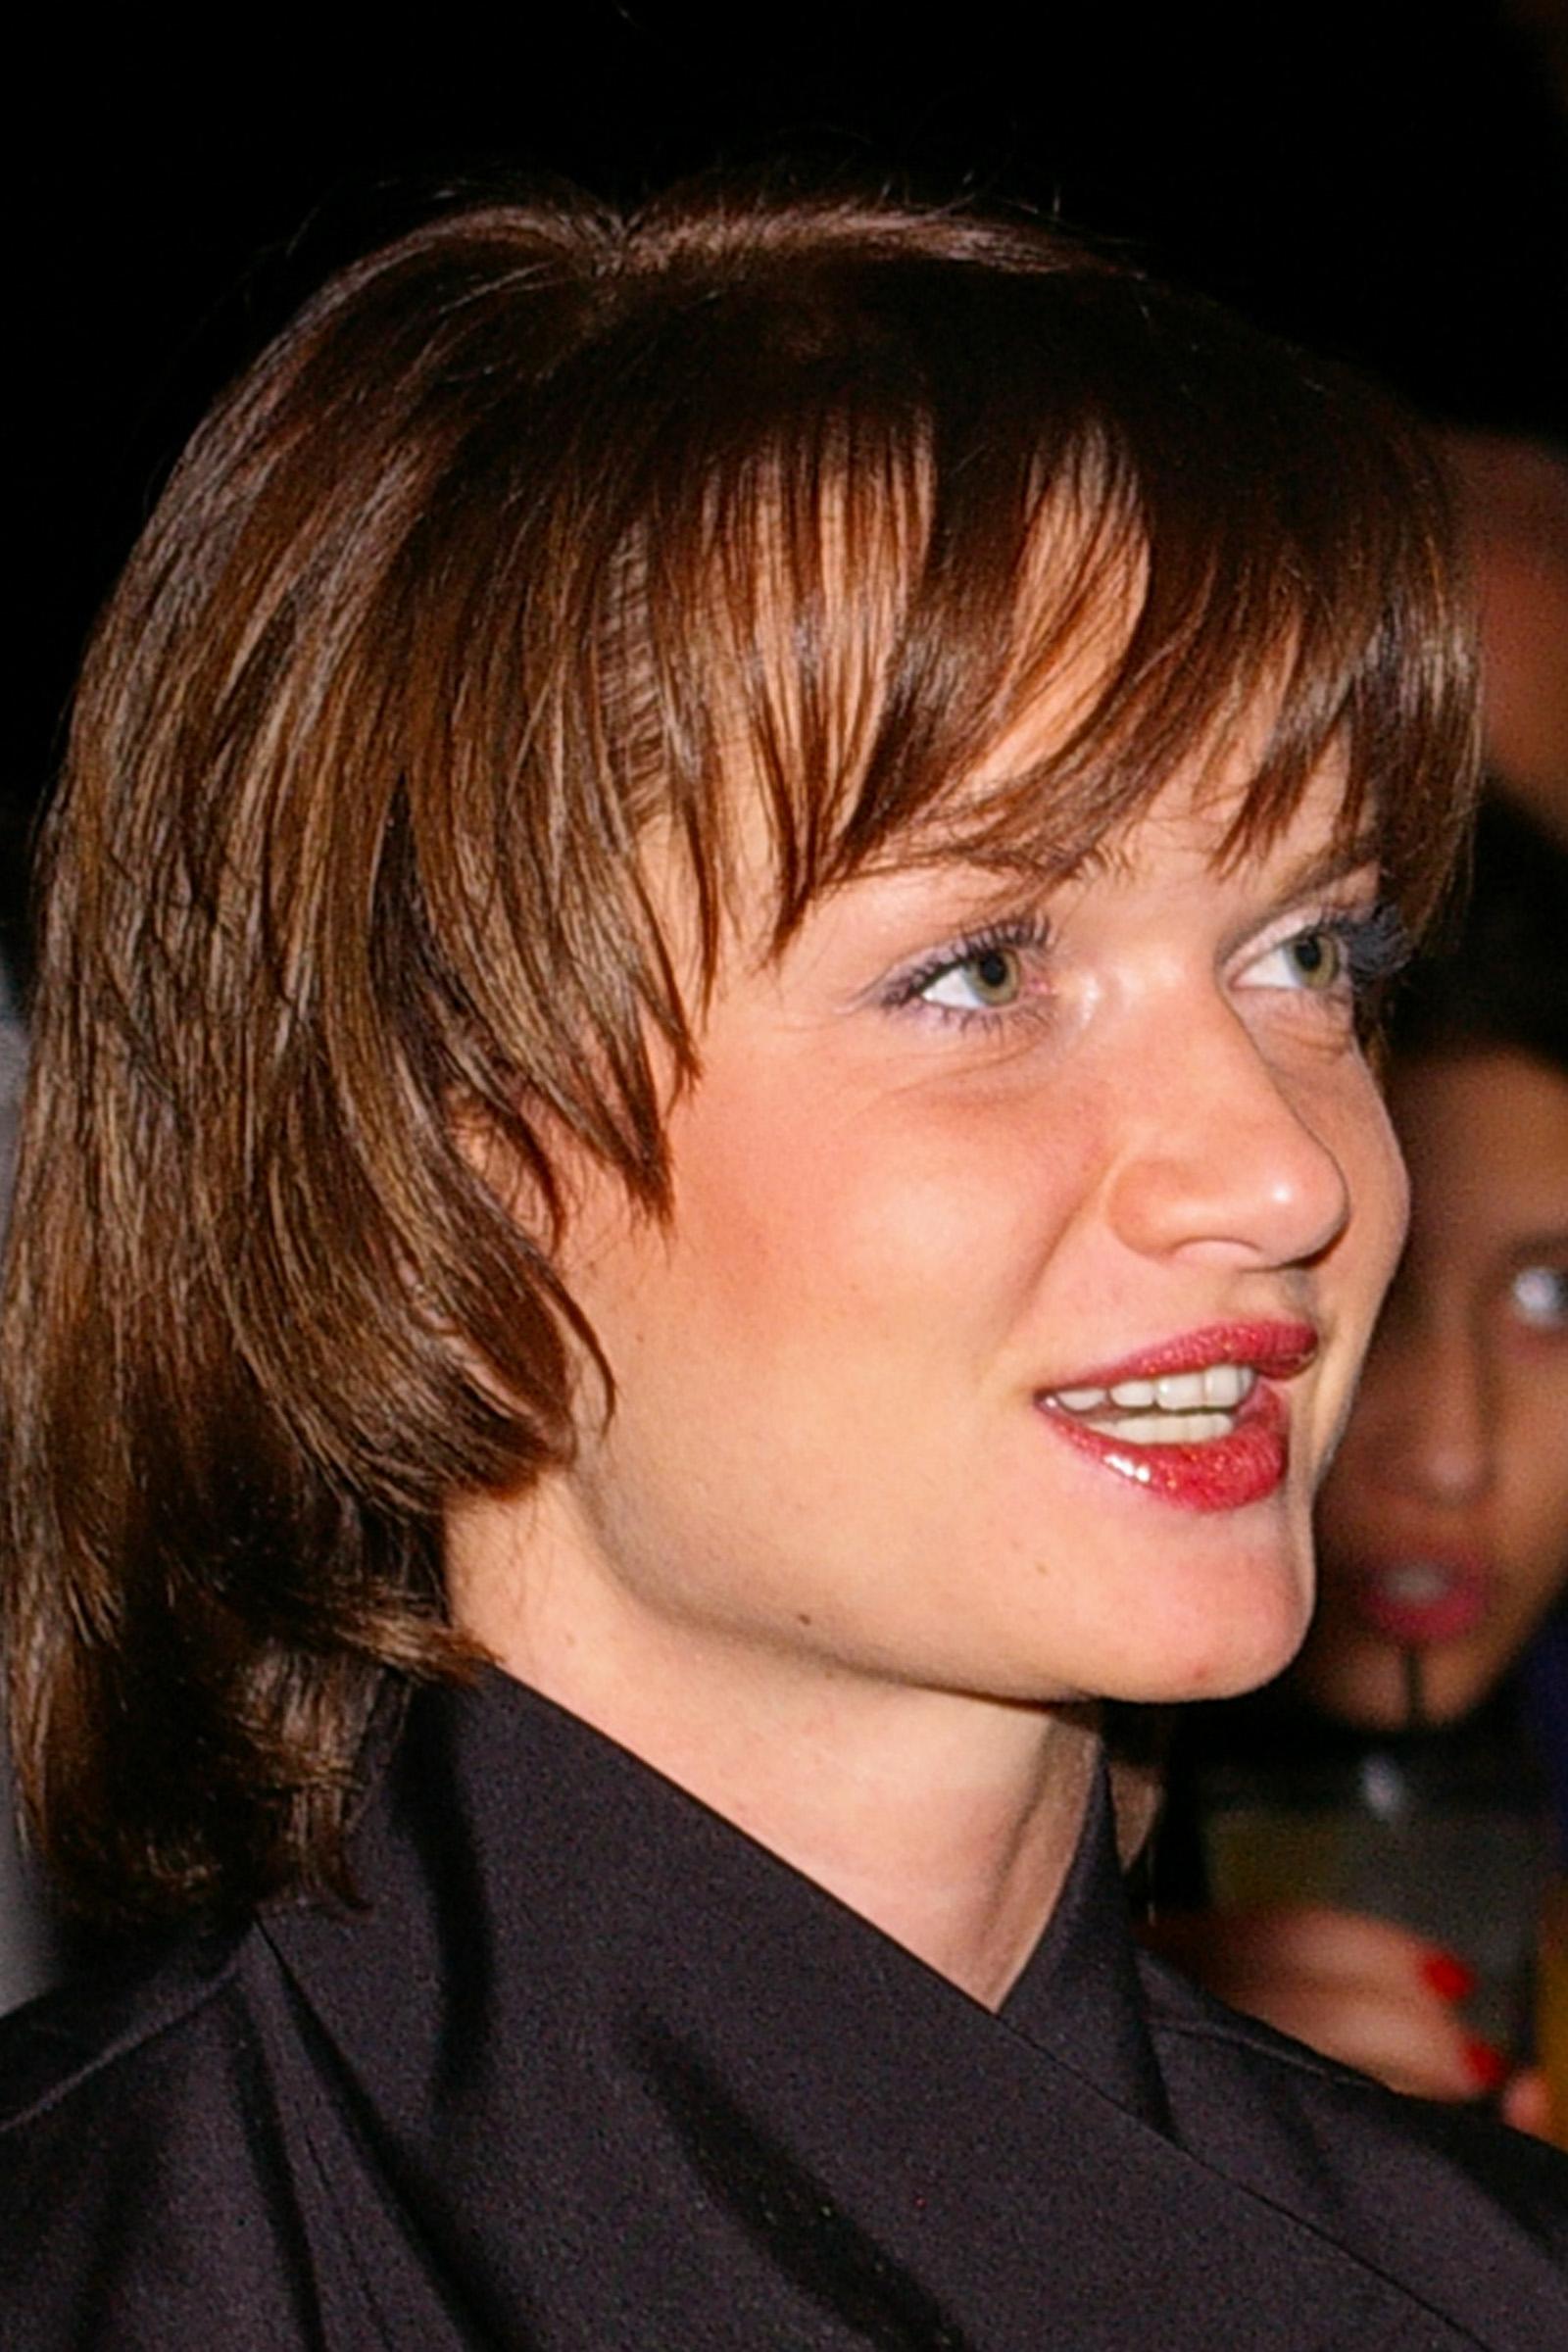 Svetlana Khorkina - Wikipedia